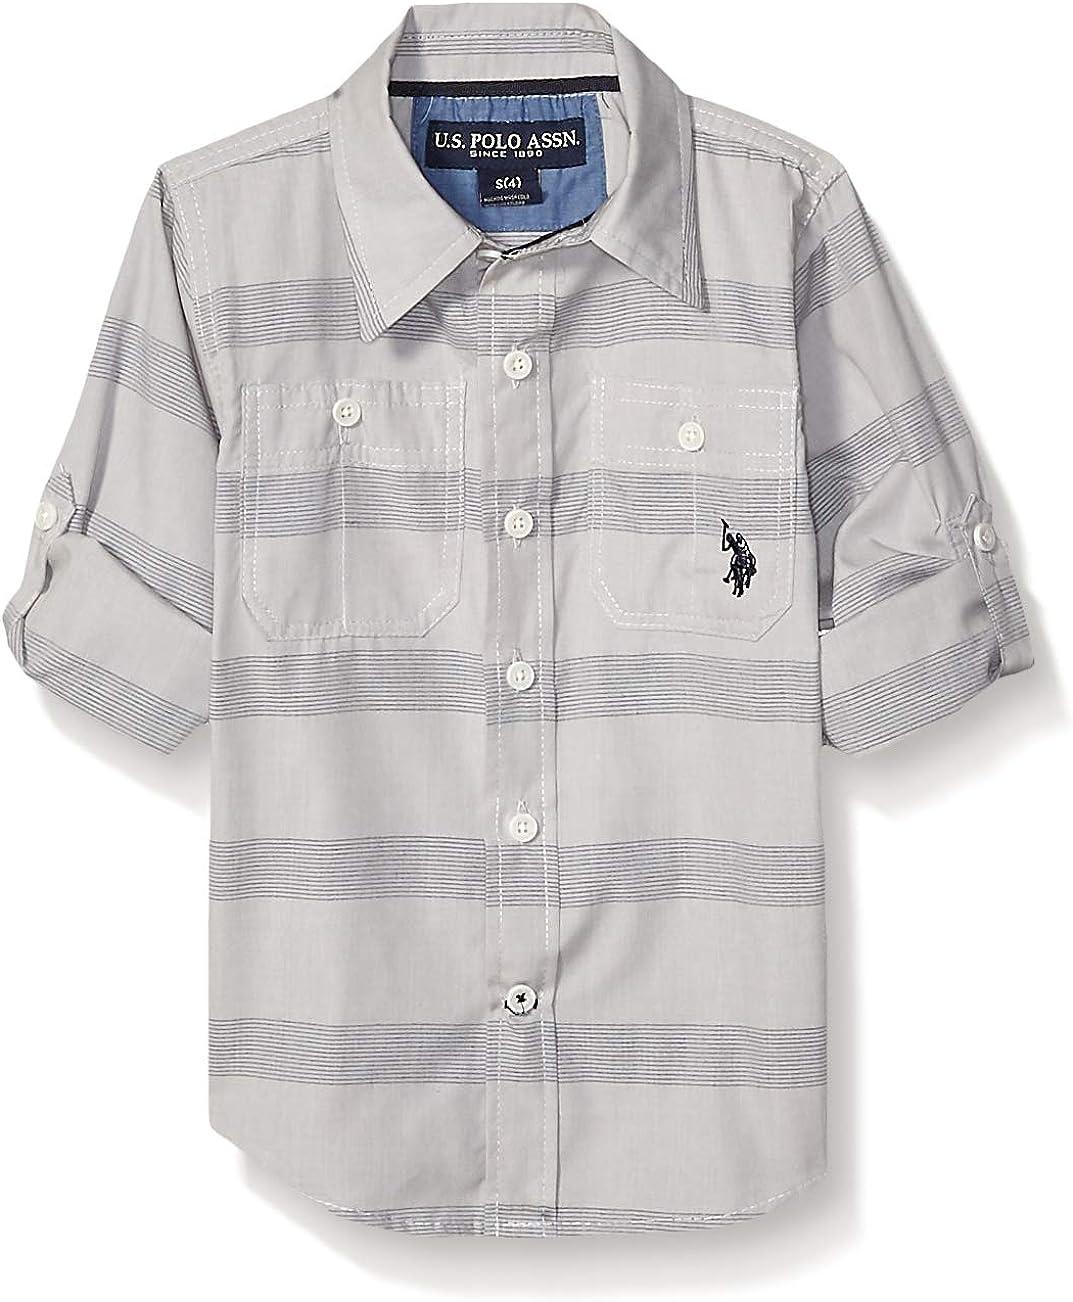 U.S. Polo Assn. Boys' Long Sleeve Striped Poplin Woven Shirt